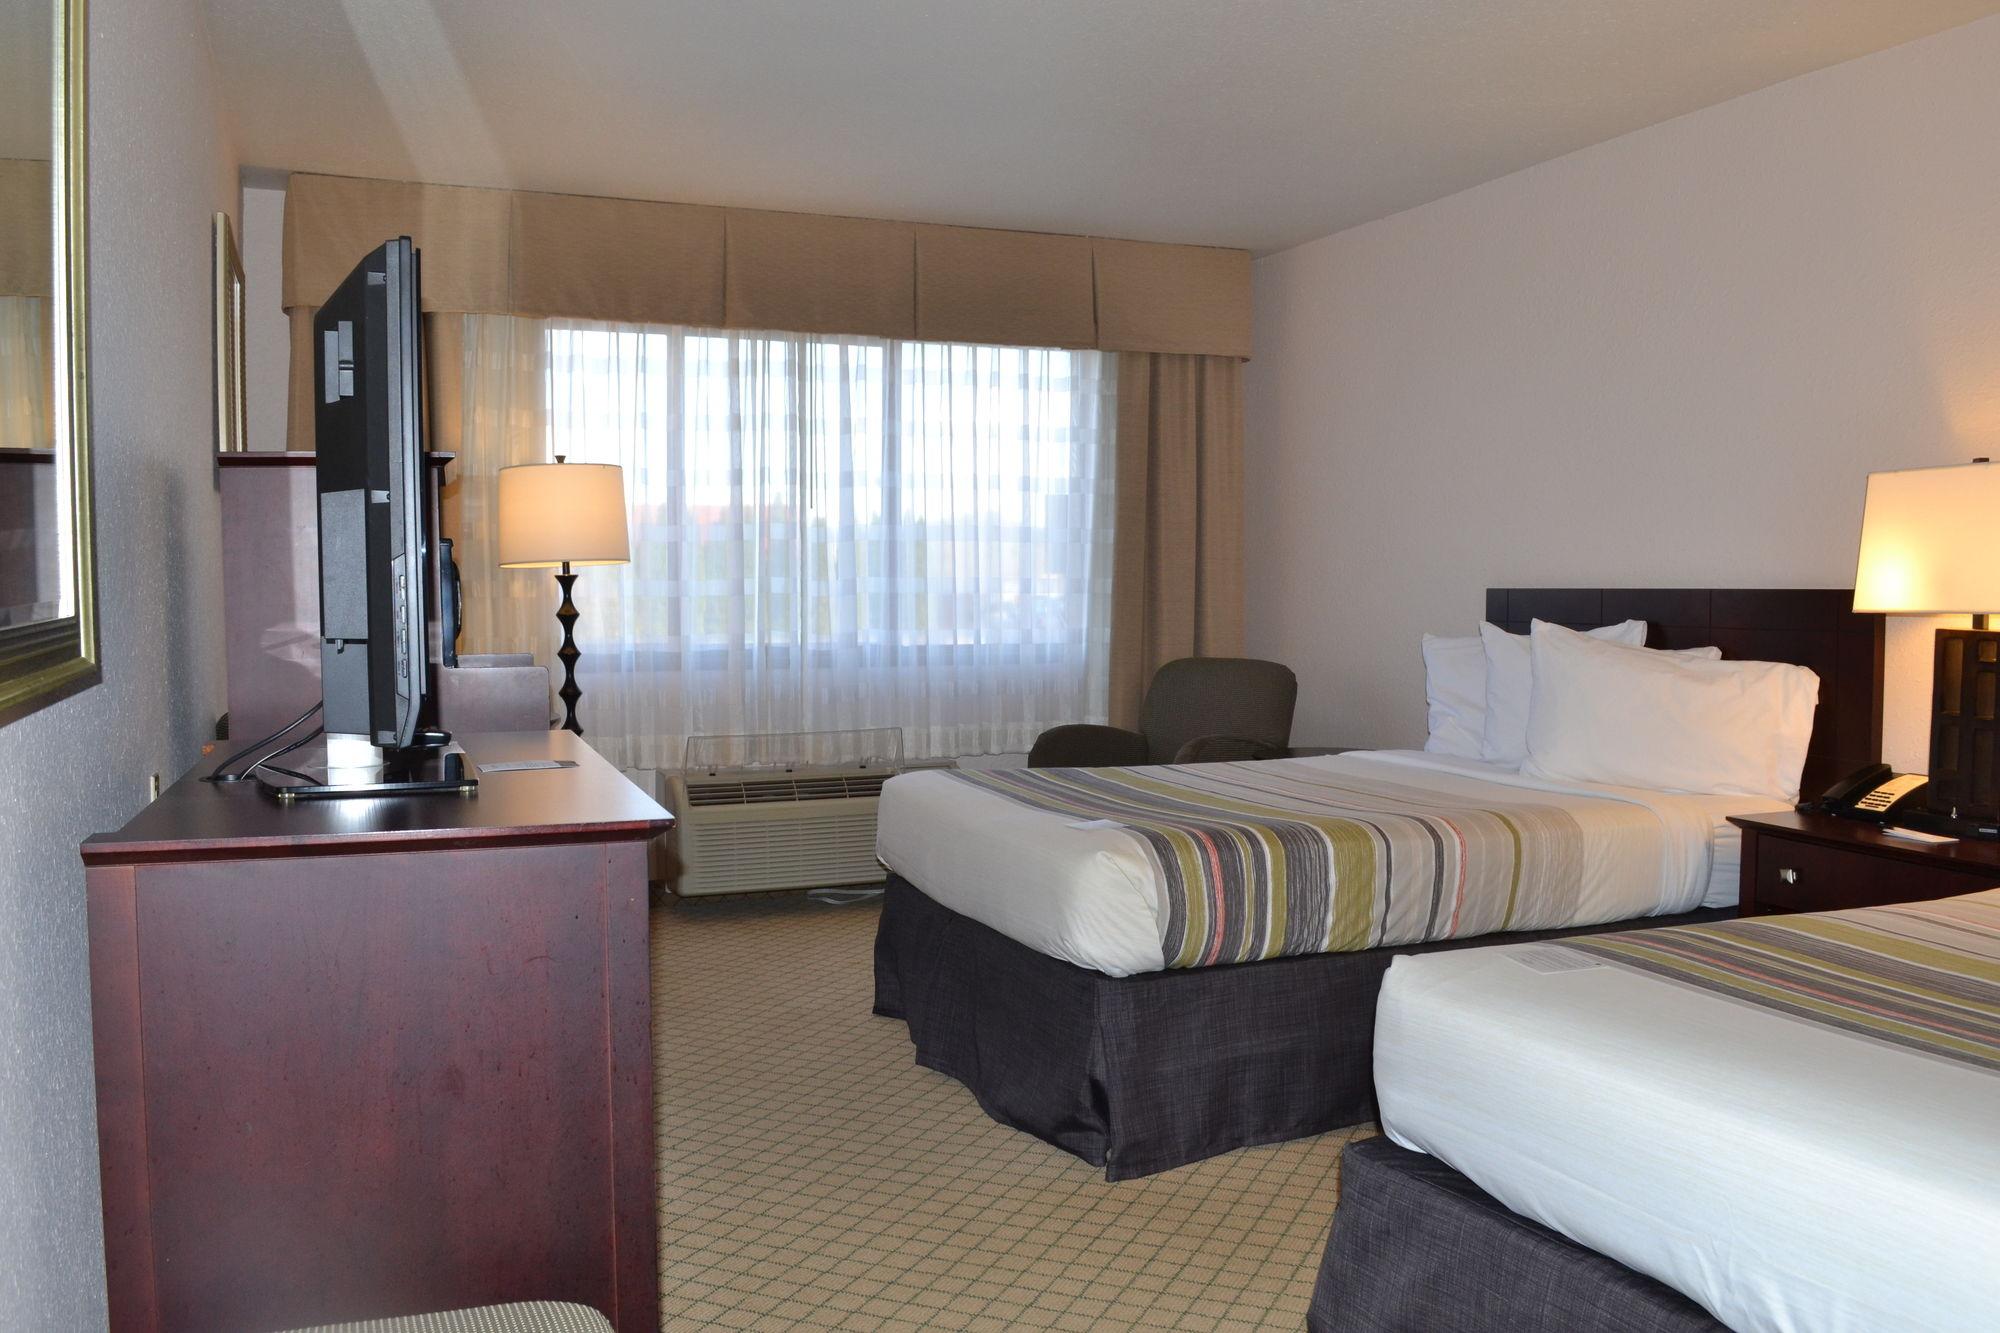 Holiday Inn Express Abingdon, Va in Abingdon, VA